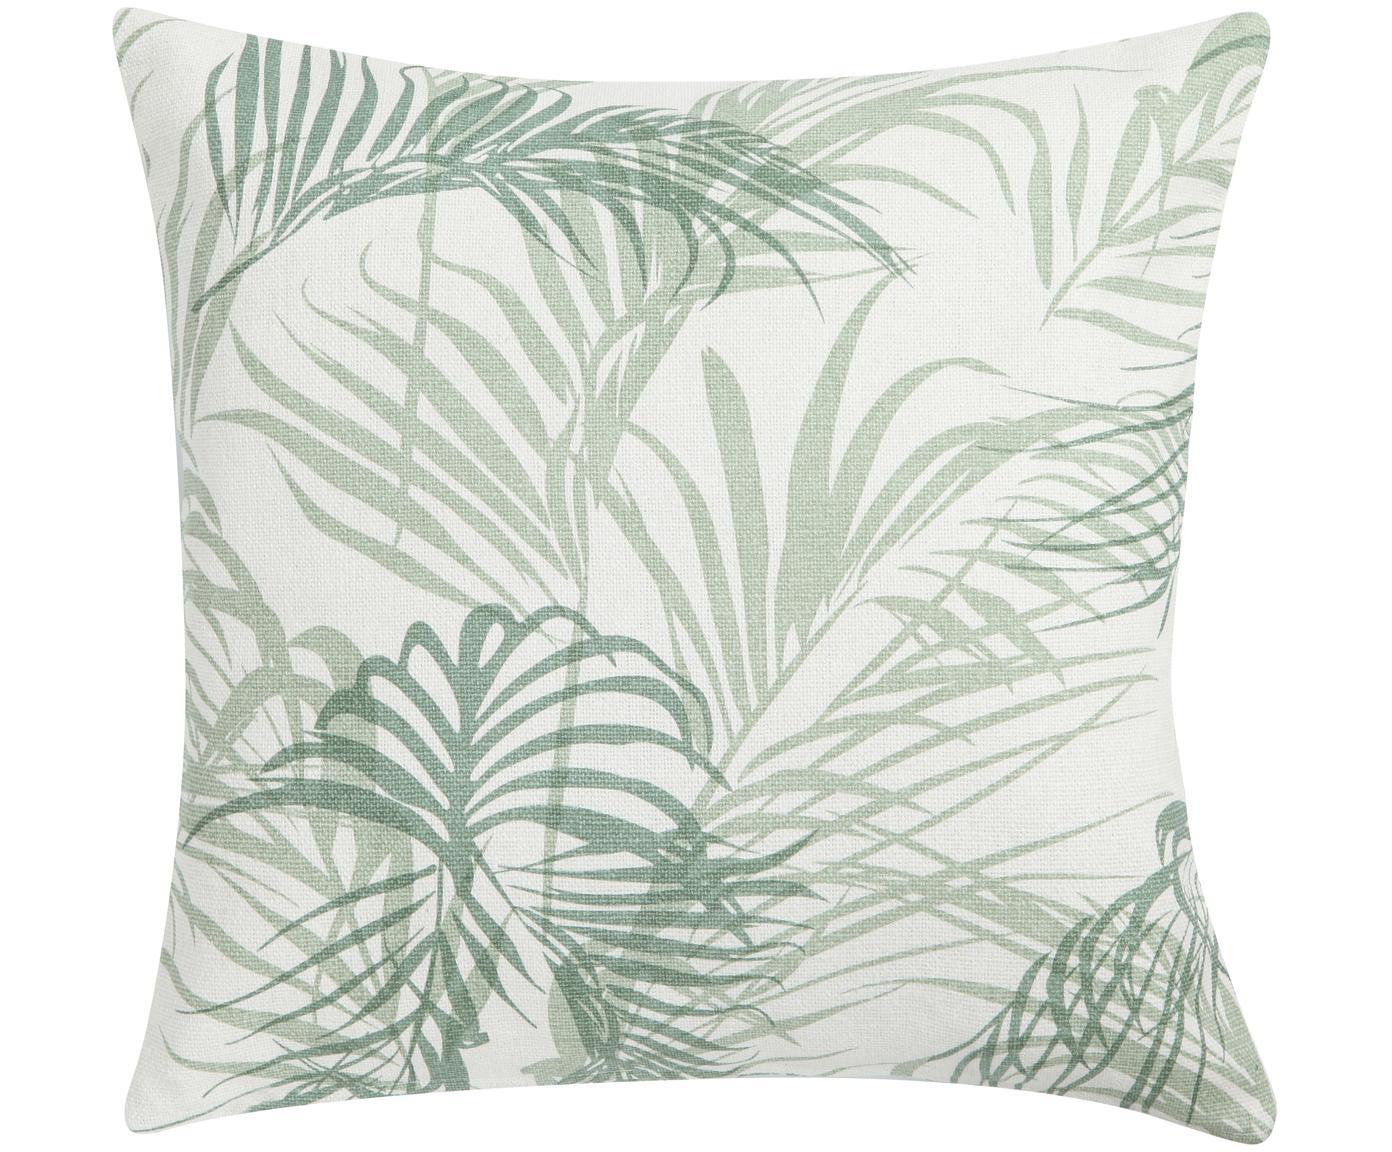 Cojín Palm Leaf, con relleno, Funda: 100%algodón, Blanco crudo, verde, An 45 x L 45 cm